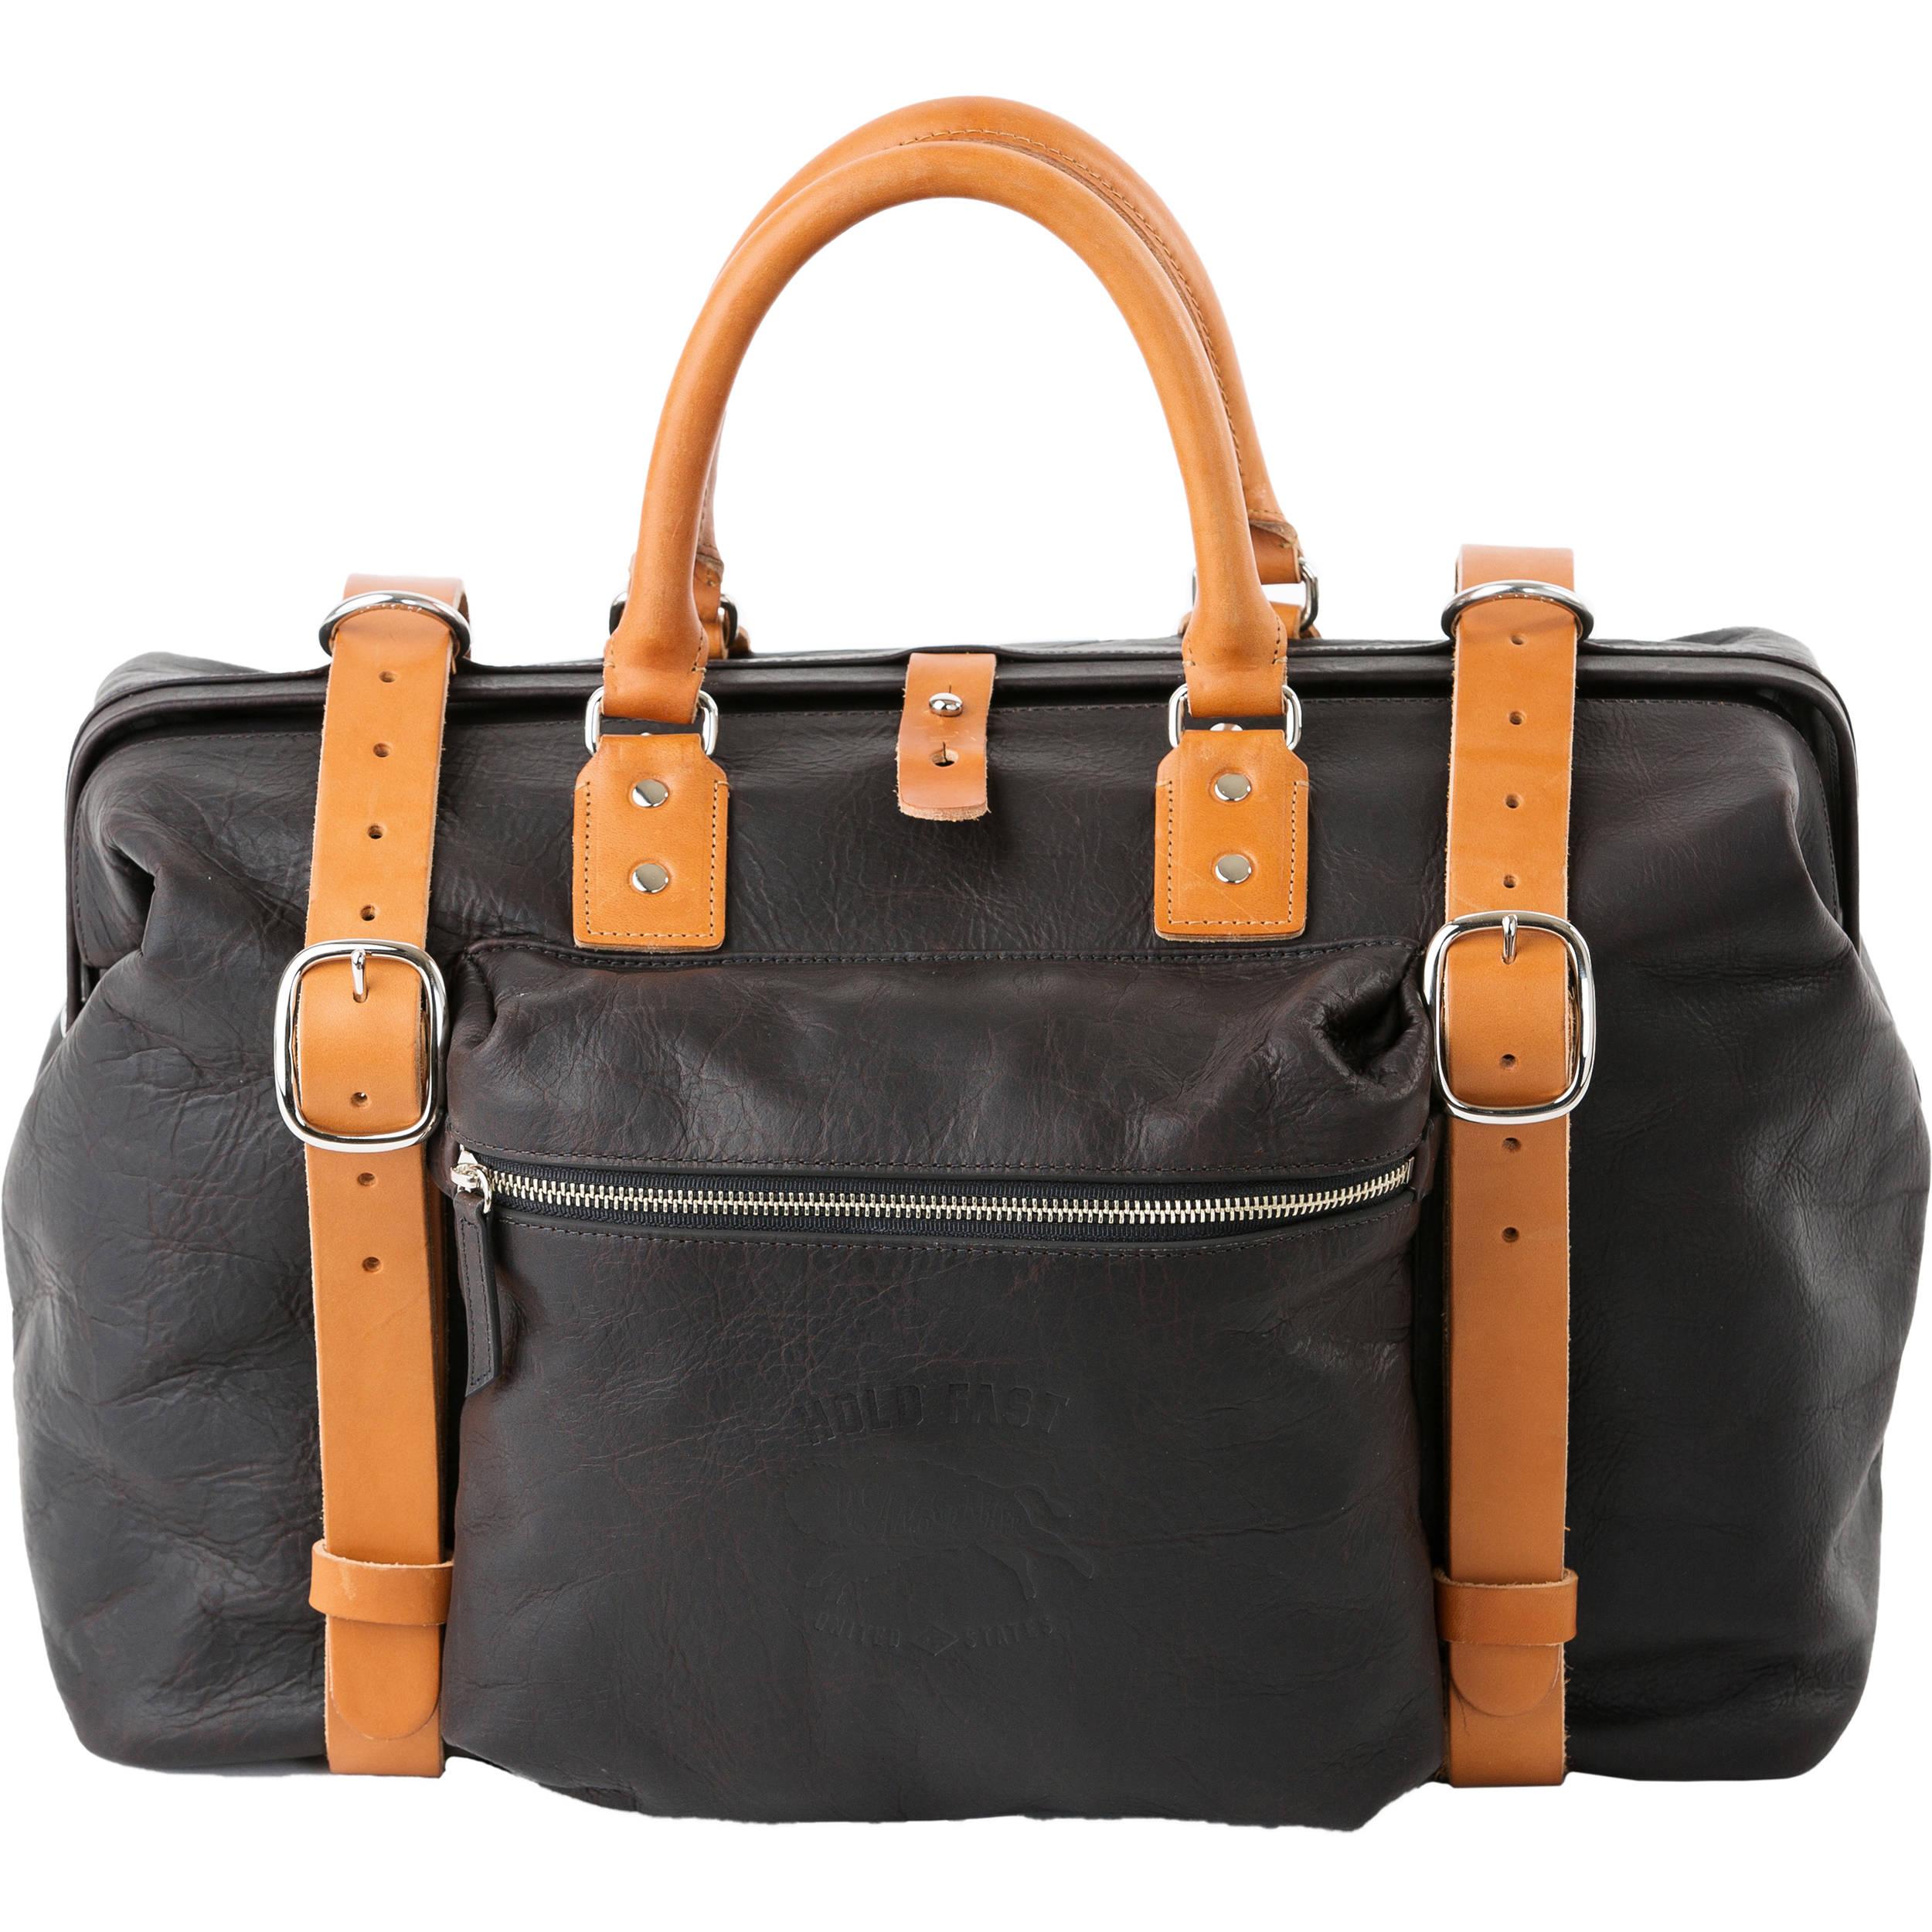 Camera Gear Bags : Holdfast gear roamographer camera bag black regular